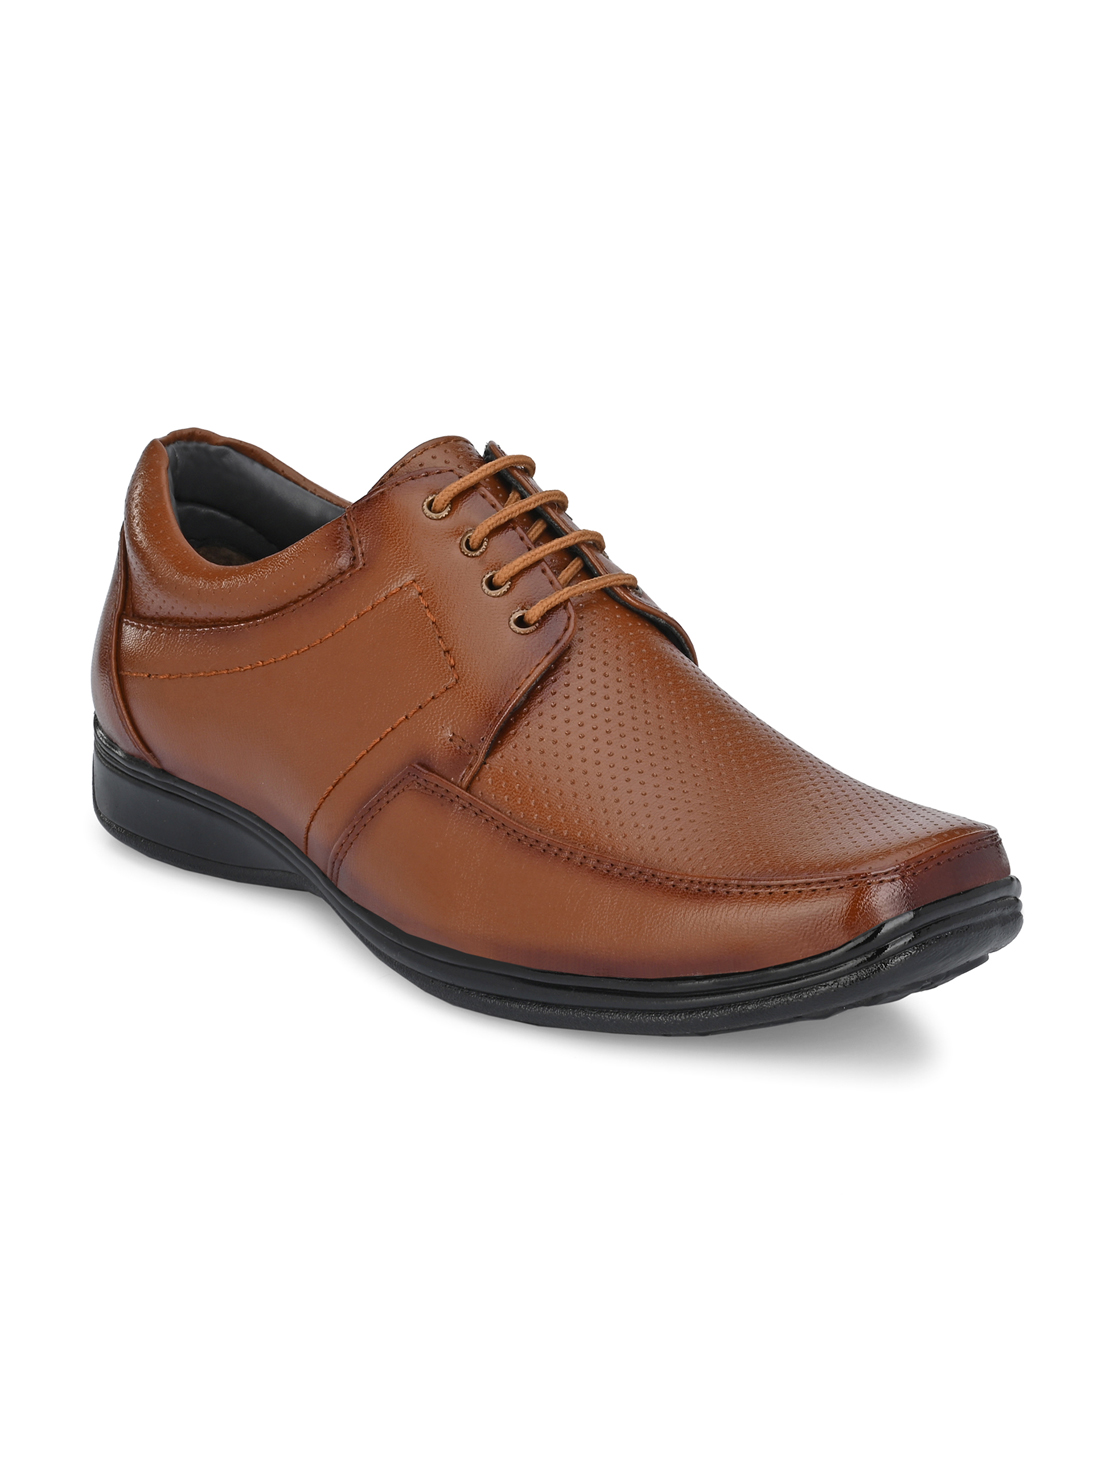 Guava   Guava Men's Square Toe Tan Lace-Up Formal Shoes - 6 (UK)